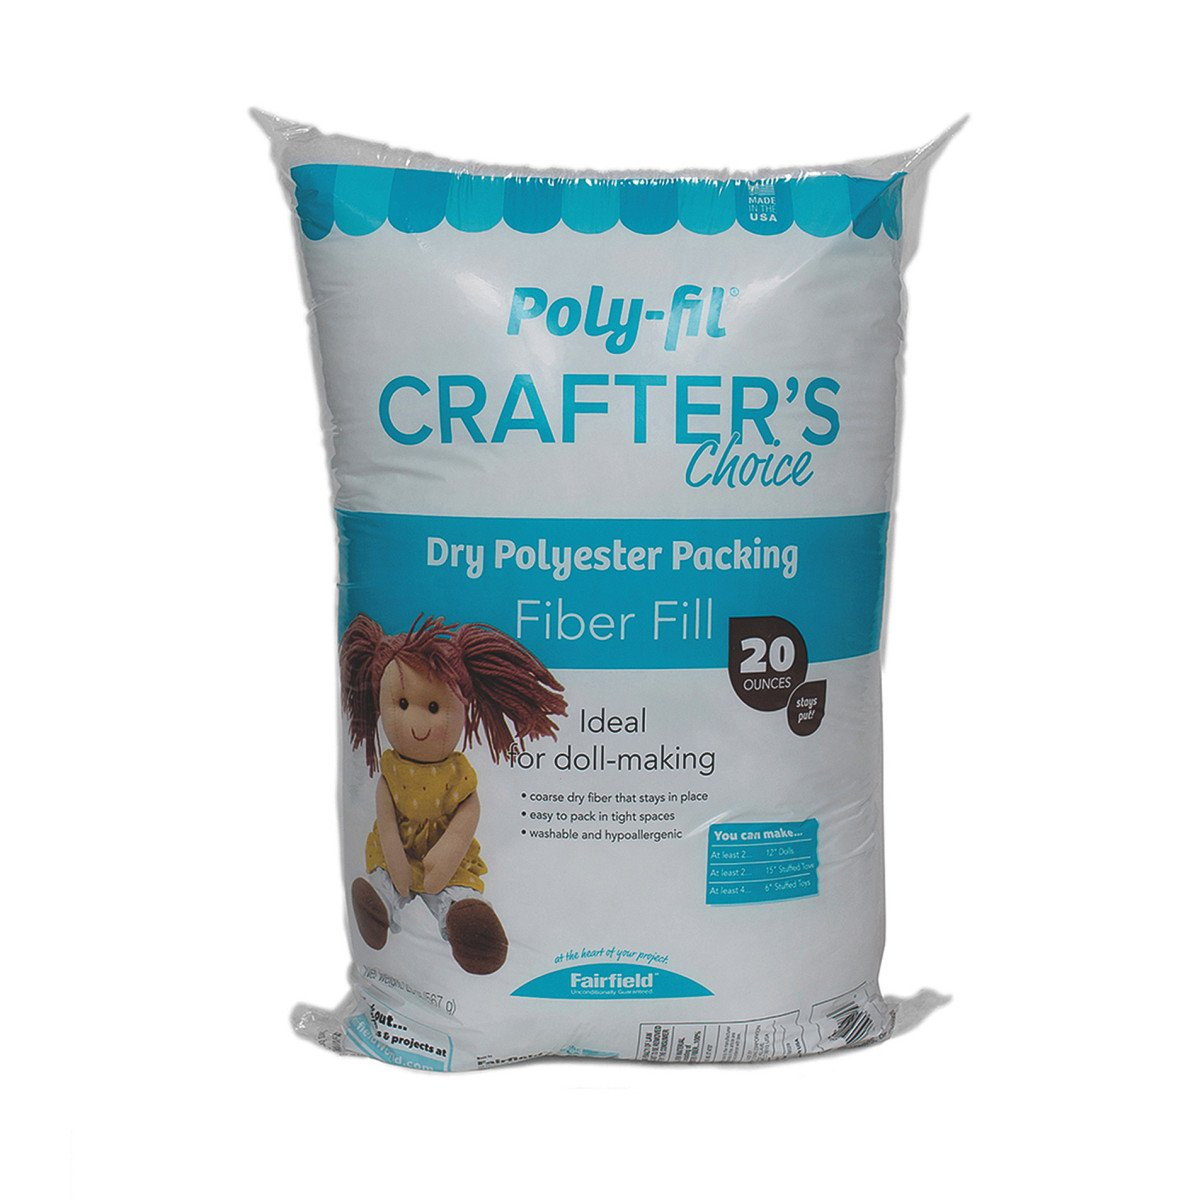 Fairfield Crafter's Choice poliestere Fiberfill-20 oz, altri Notions Marketing 488945